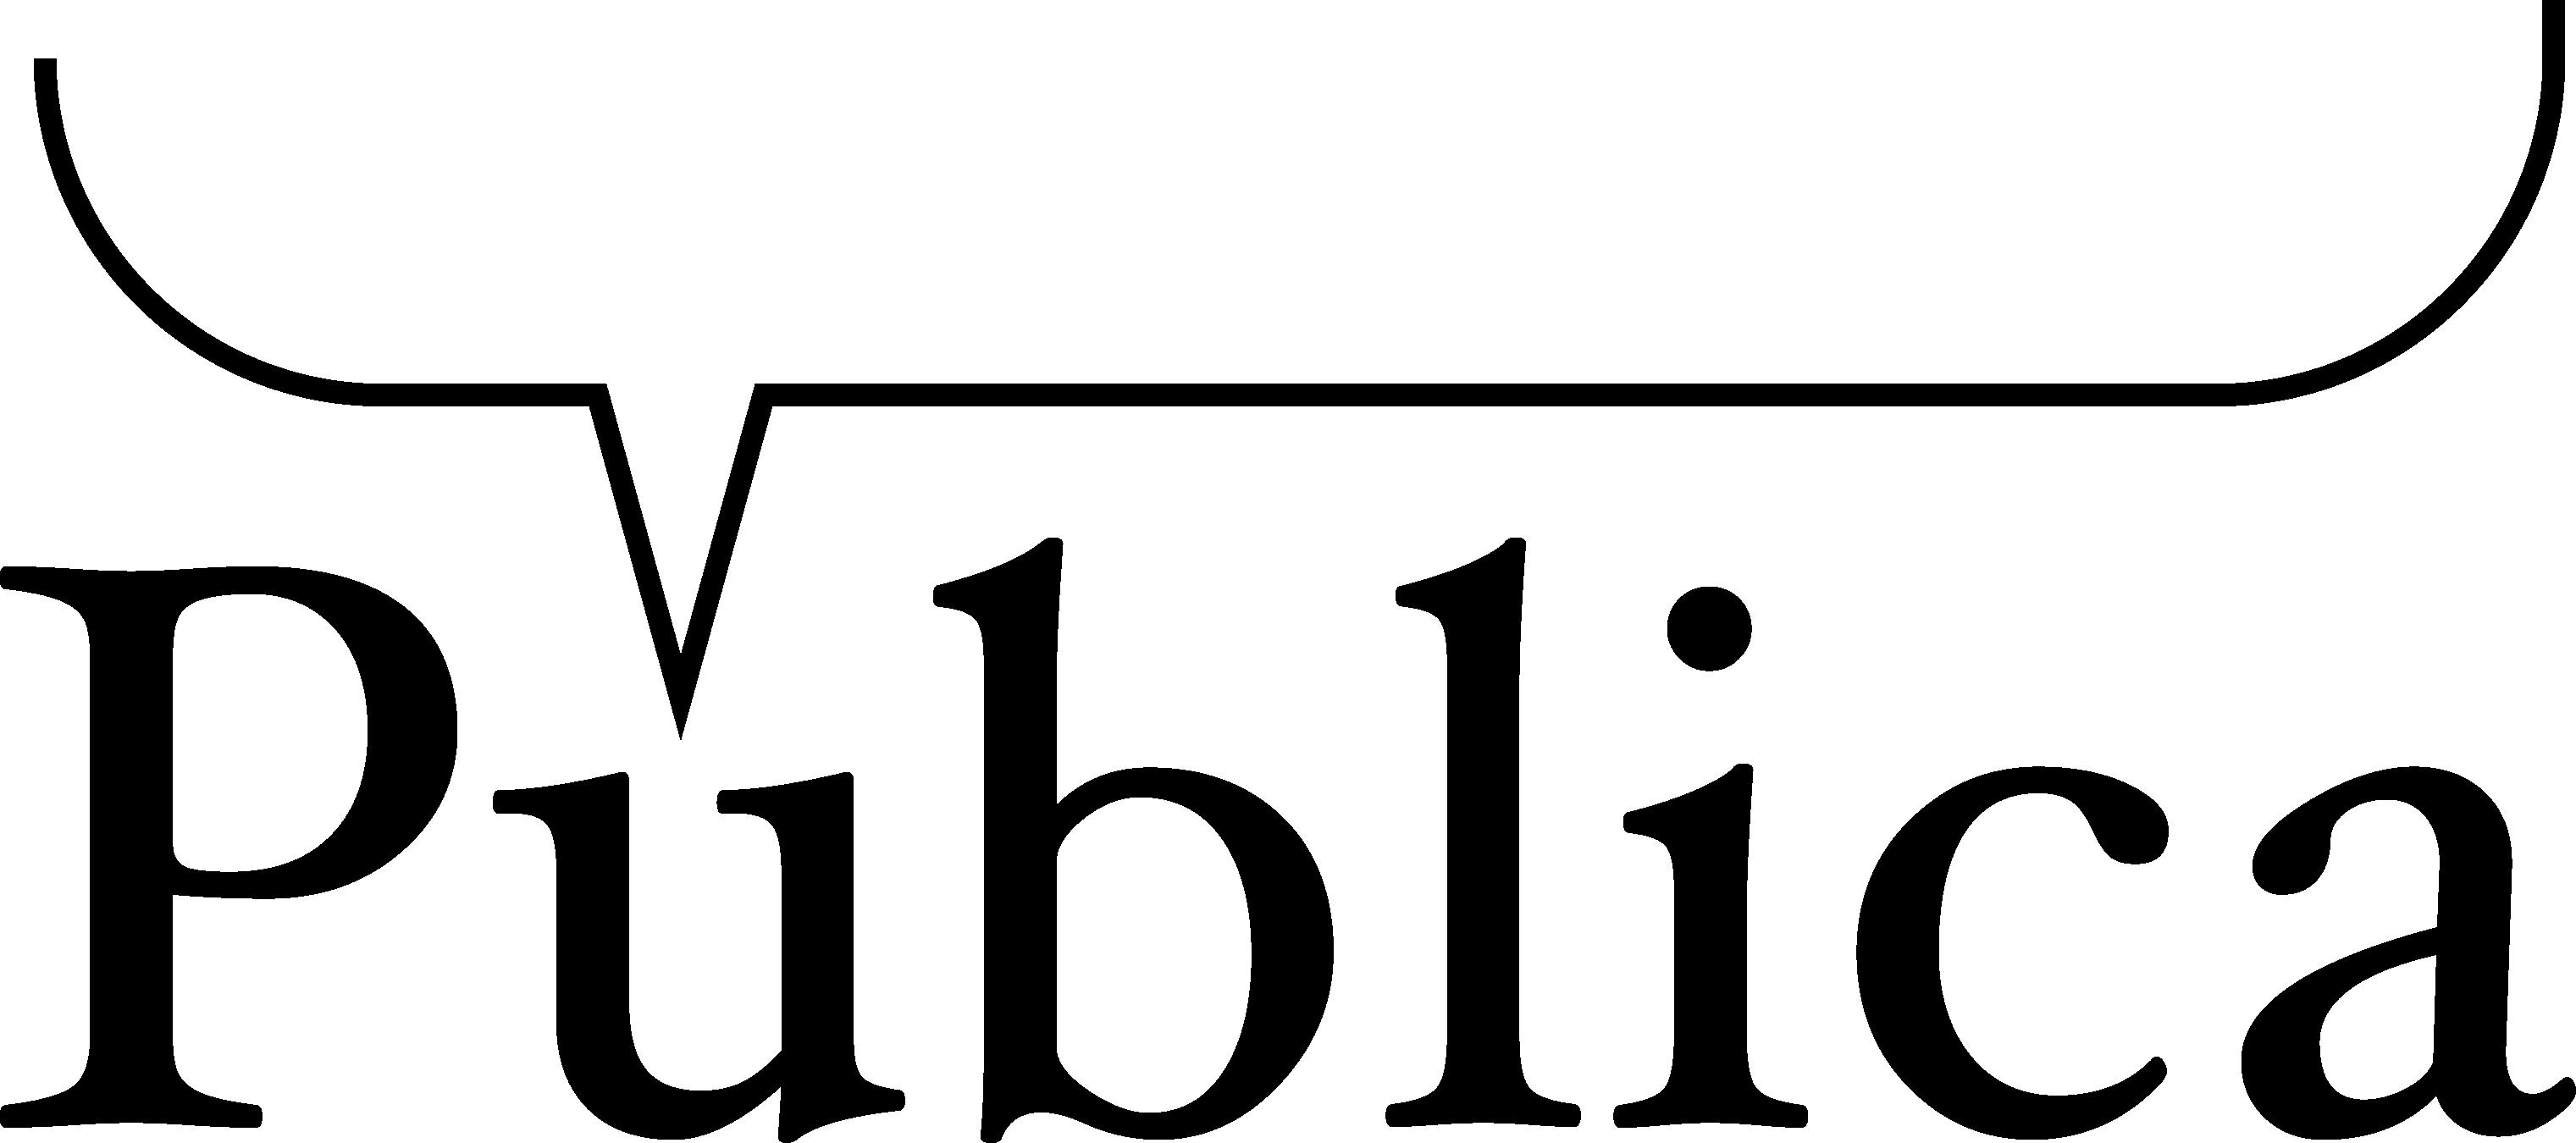 ficheiropublica logo alta 4 1png � wikip233dia a